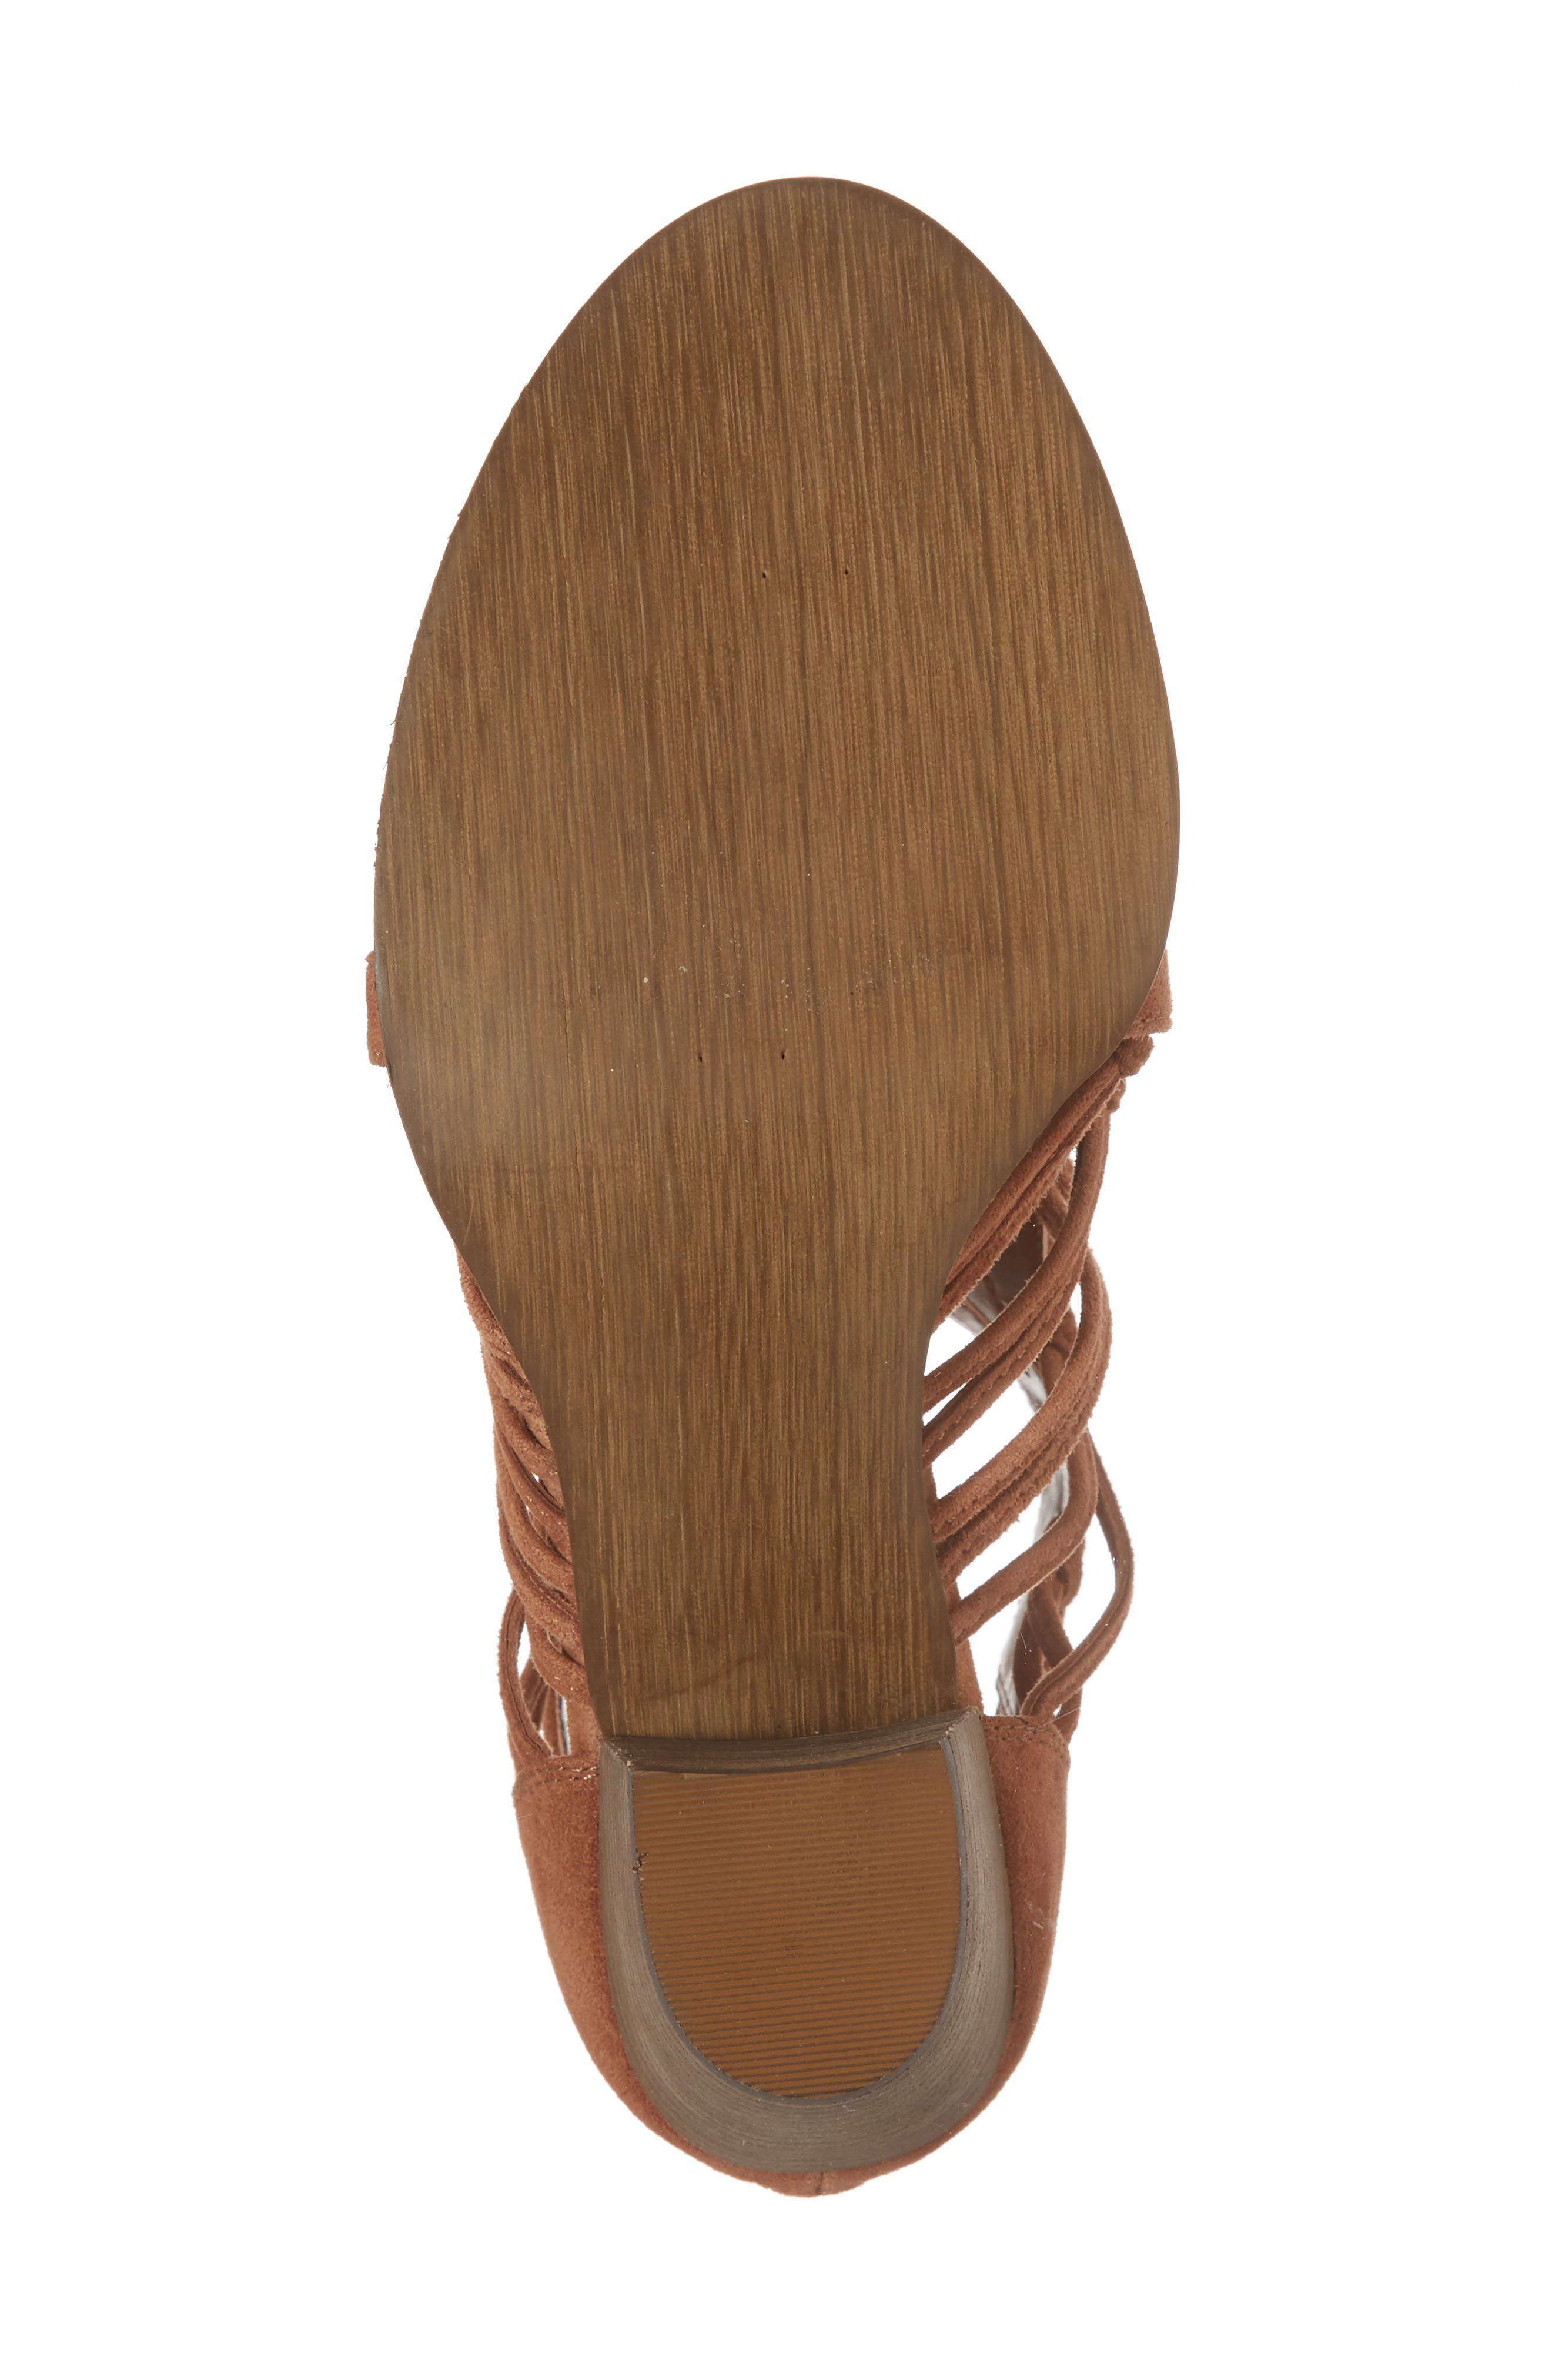 Kortez Block Heel Sandal,                             Alternate thumbnail 6, color,                             Dark Tan Suede